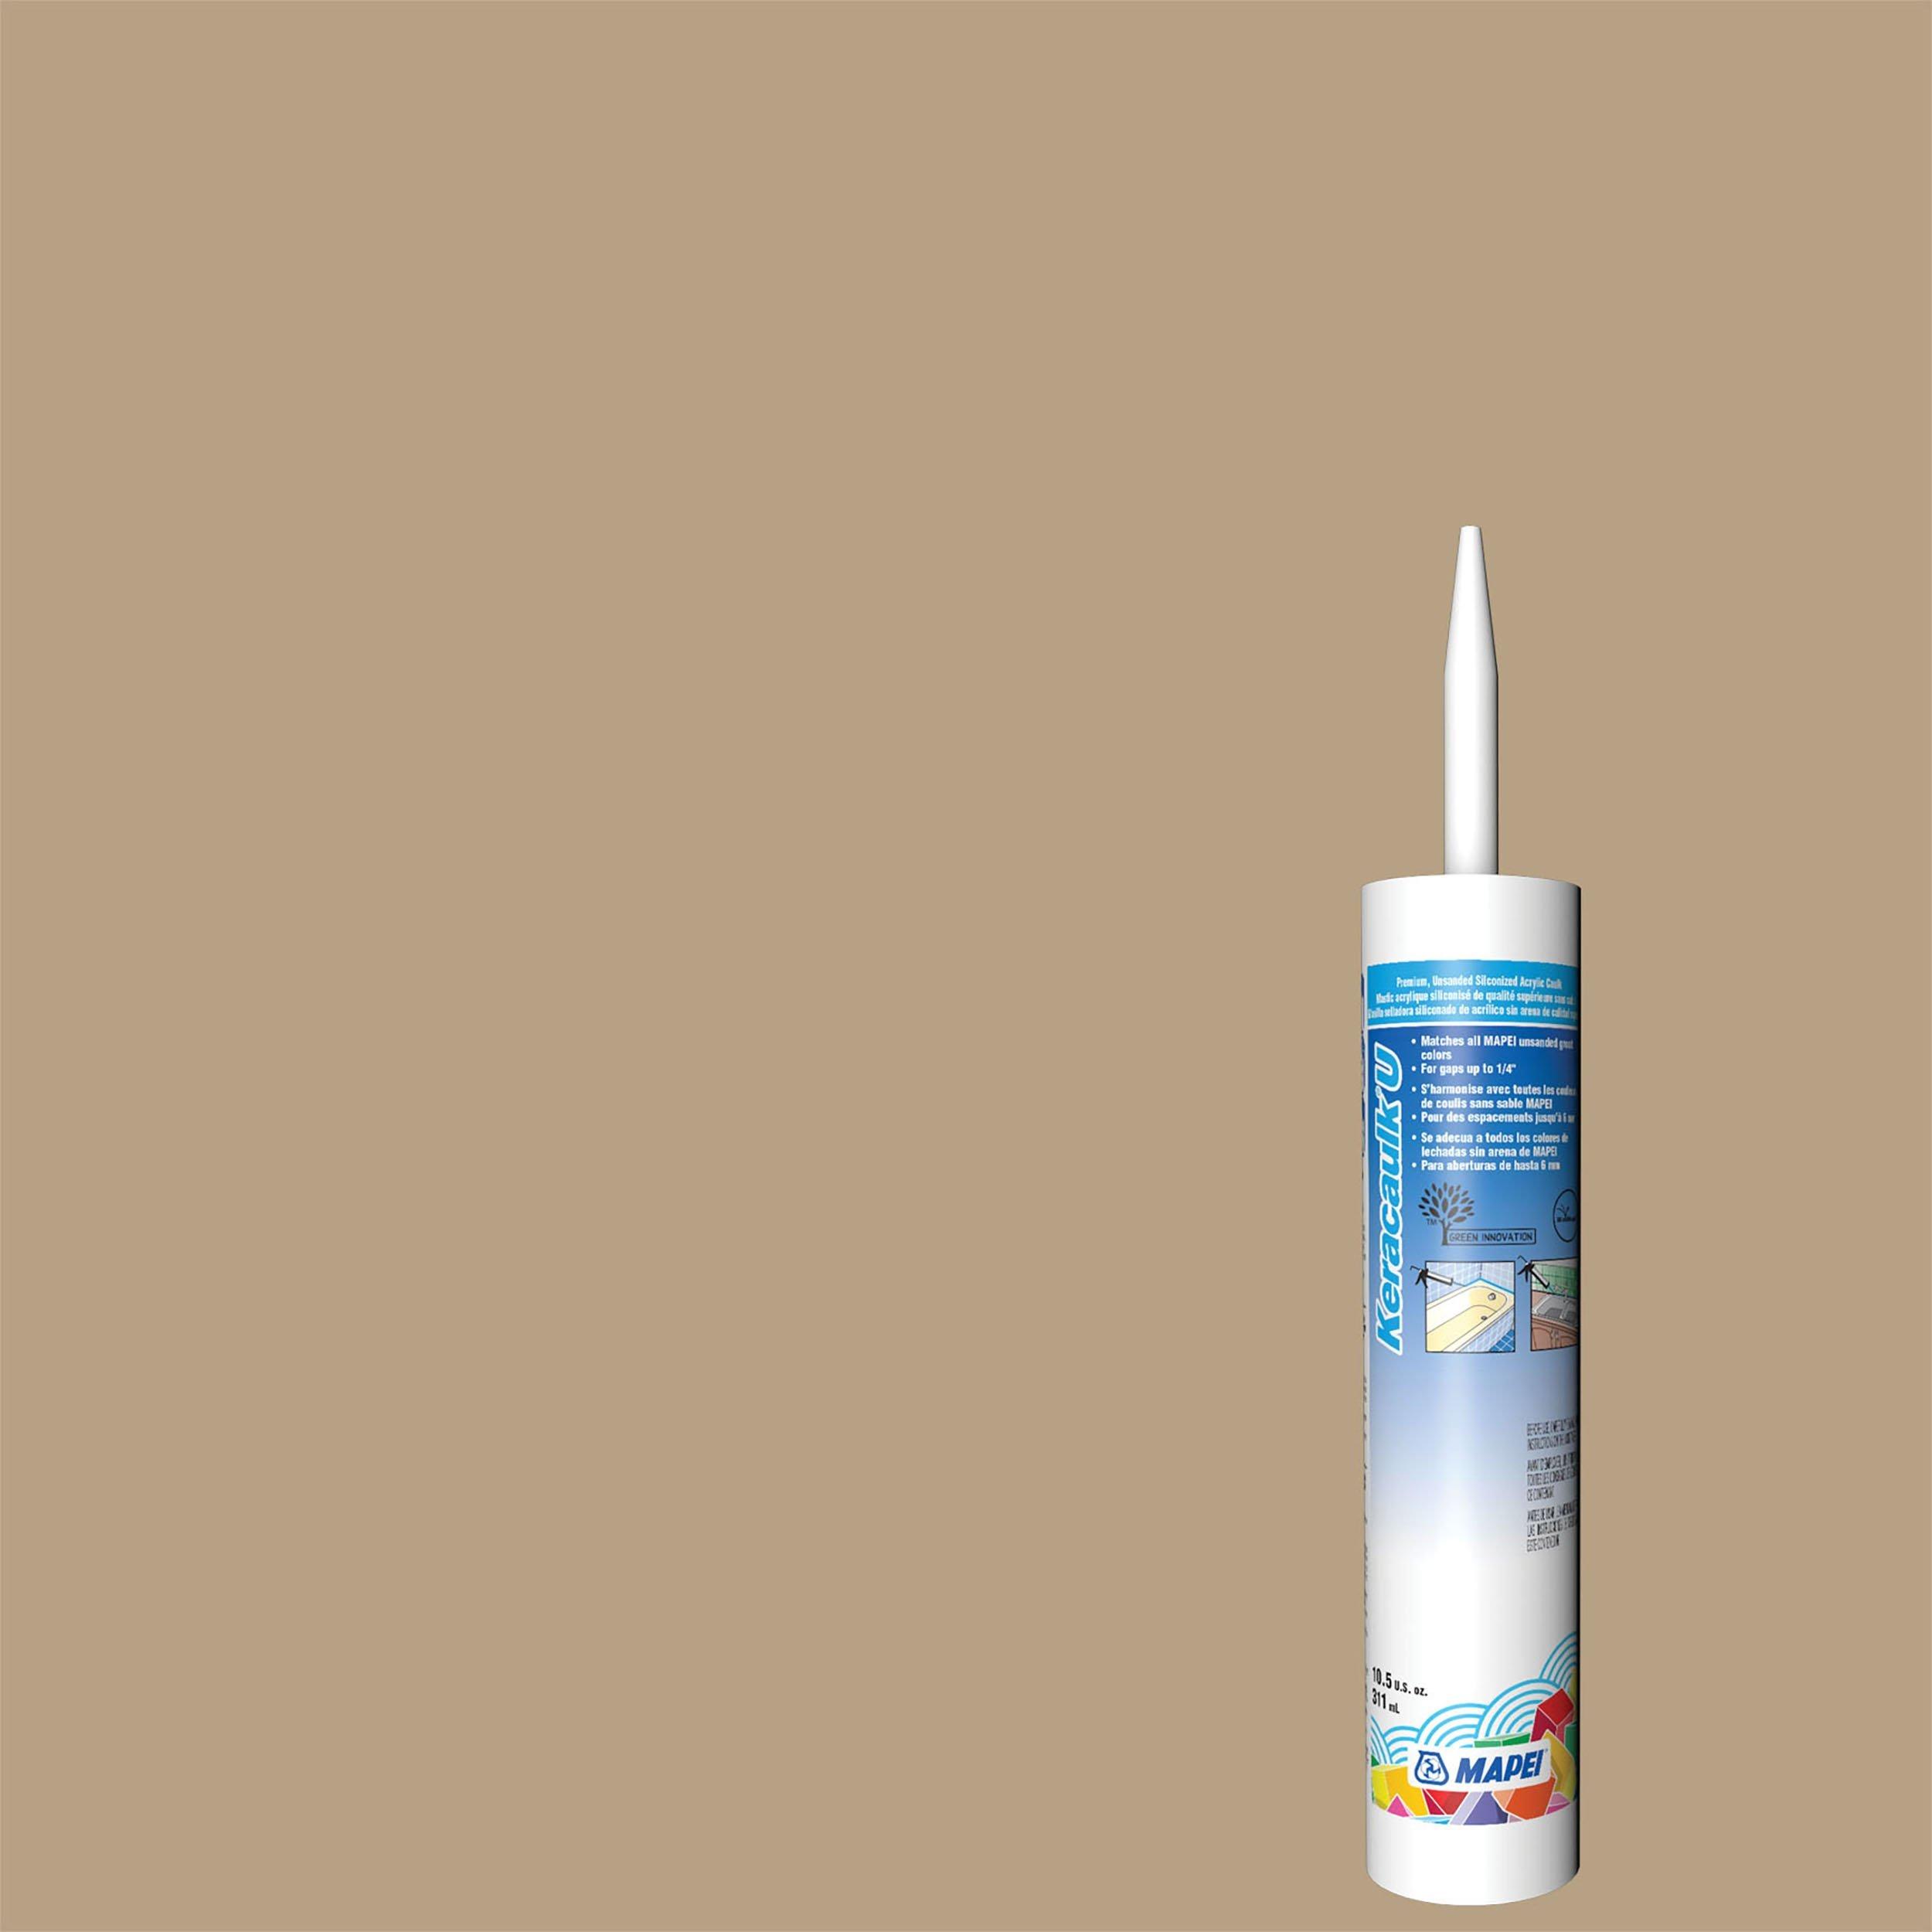 Mapei 44 Pale Umber Mapesil T Silicone Caulk 10 1 Oz